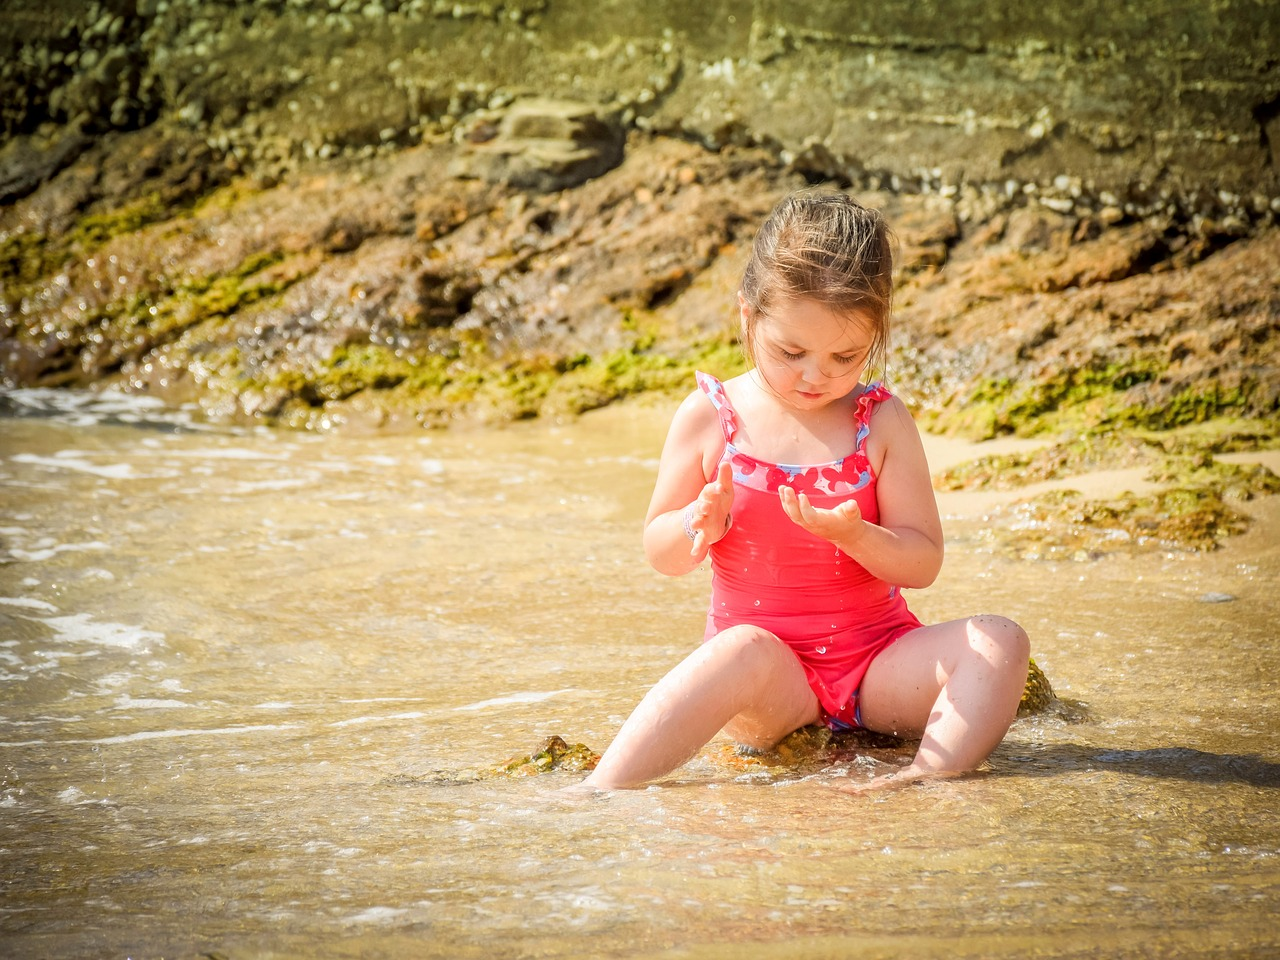 foto de praia facebook